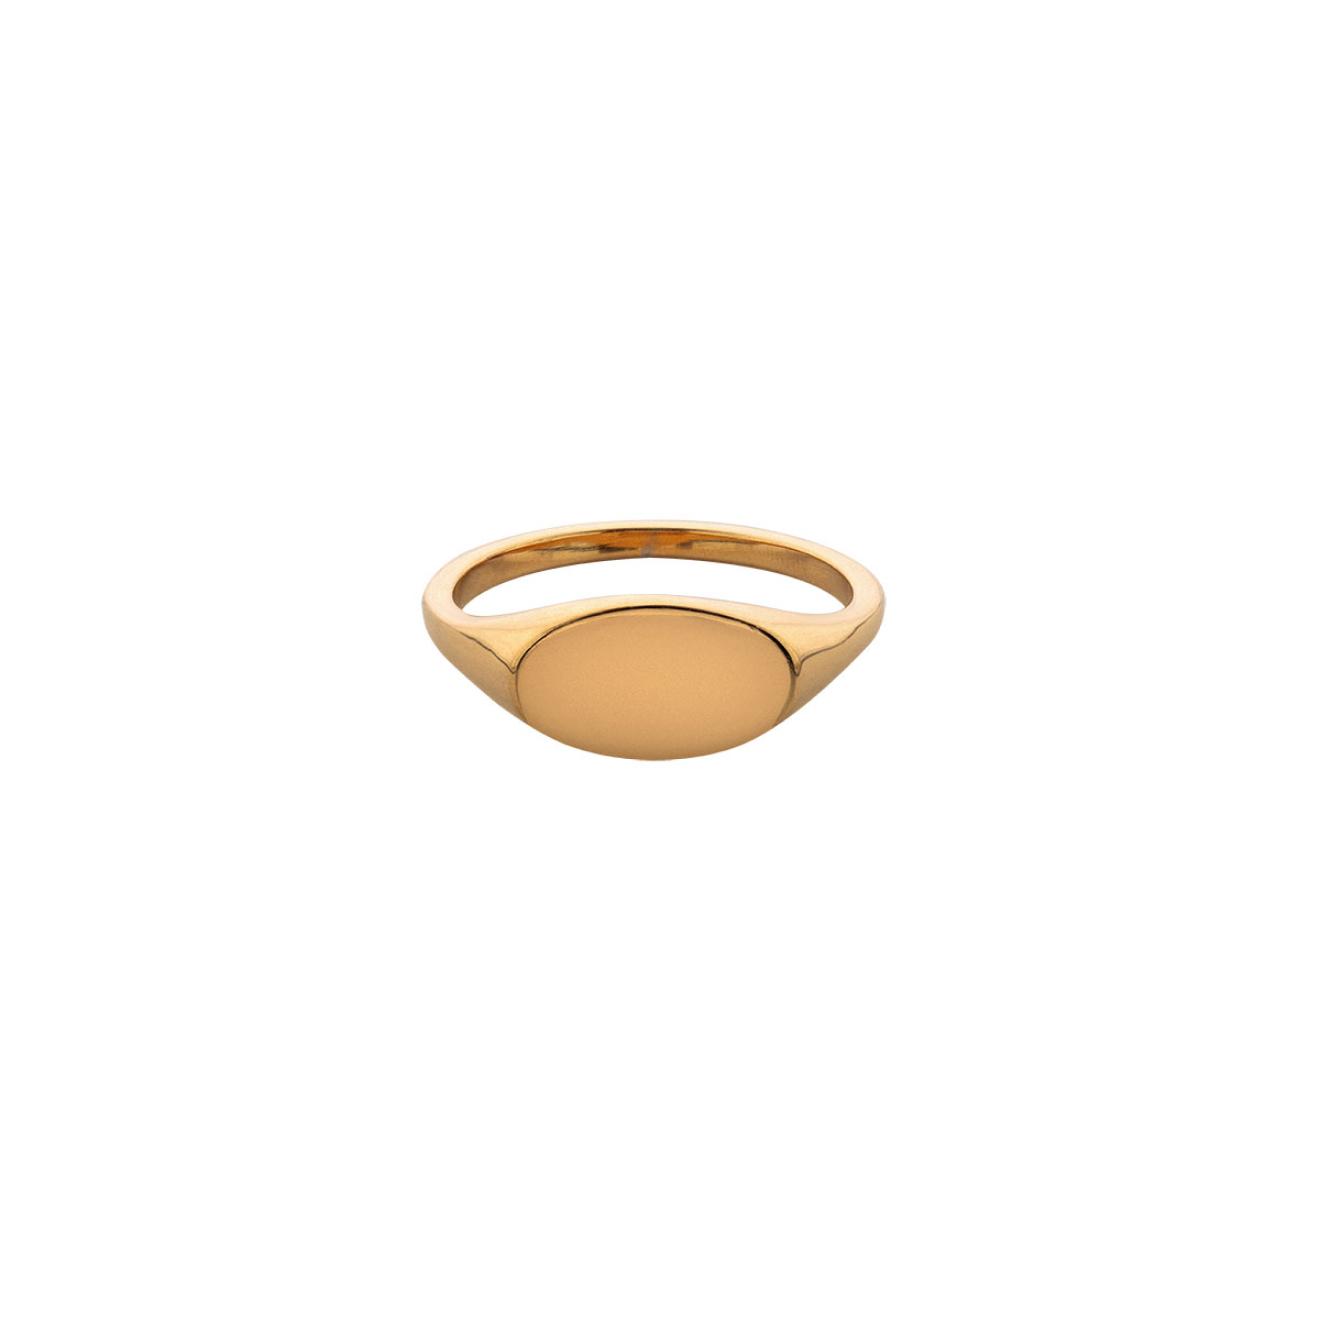 Ringstone Позолоченное кольцо-печатка Blank из серебра